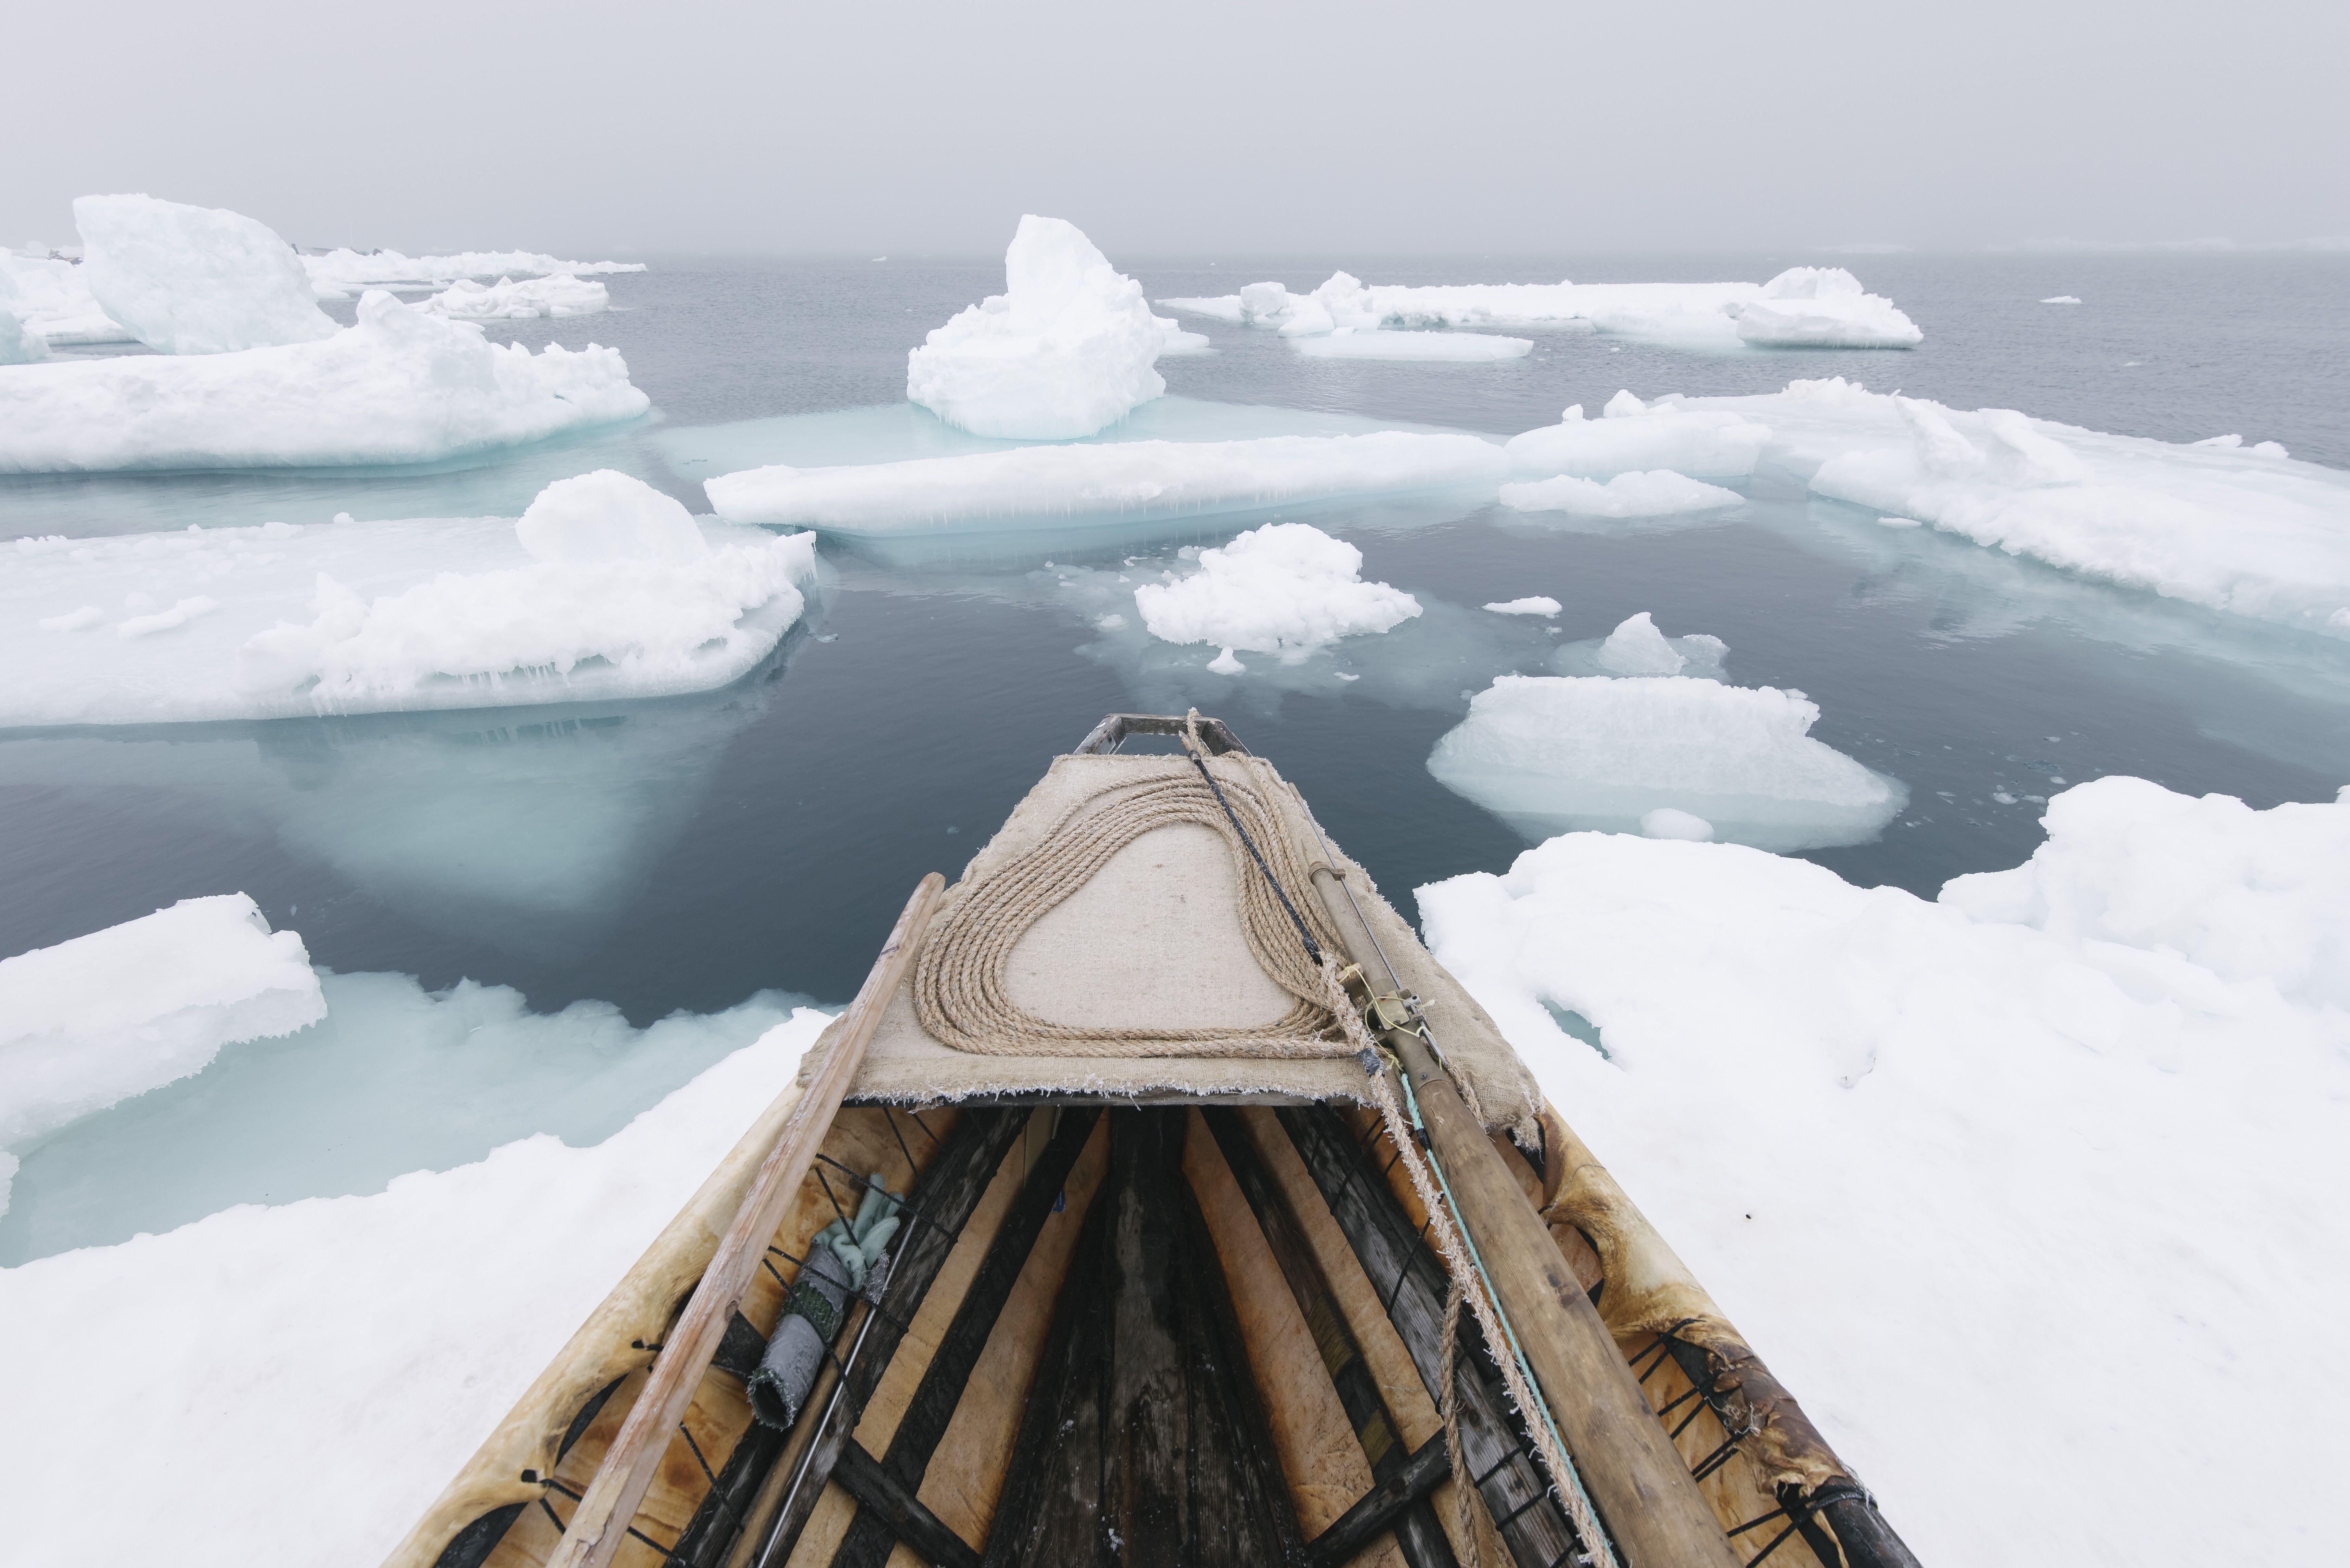 The Citi exhibition Arctic: culture and climate